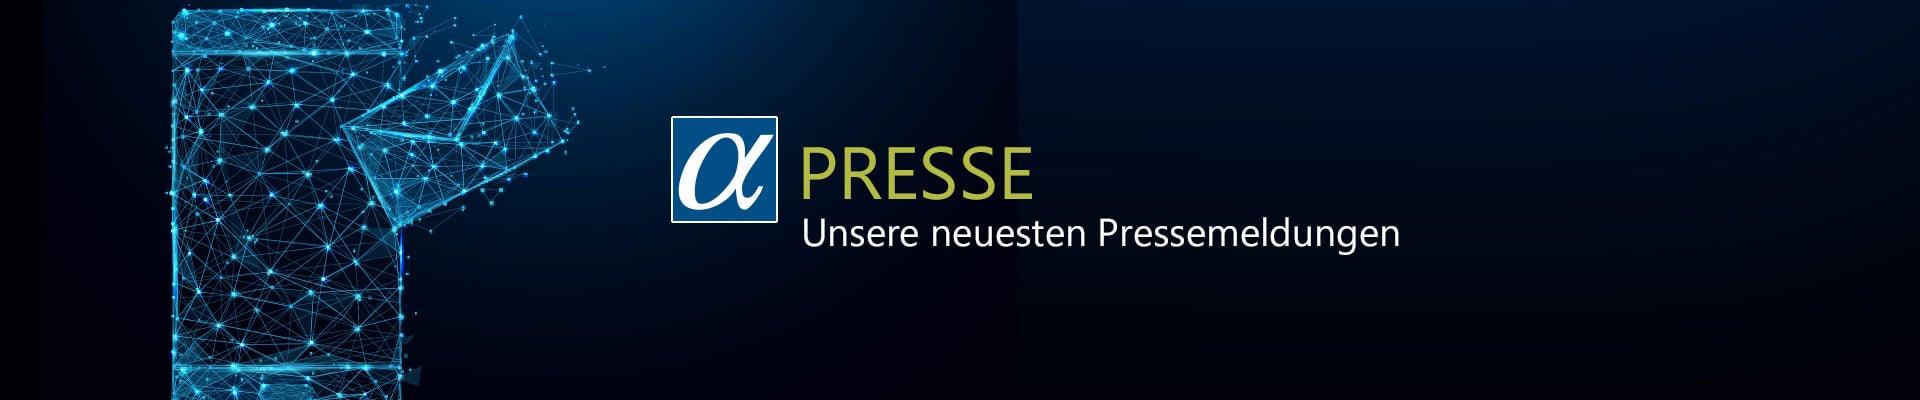 blog-presse-3